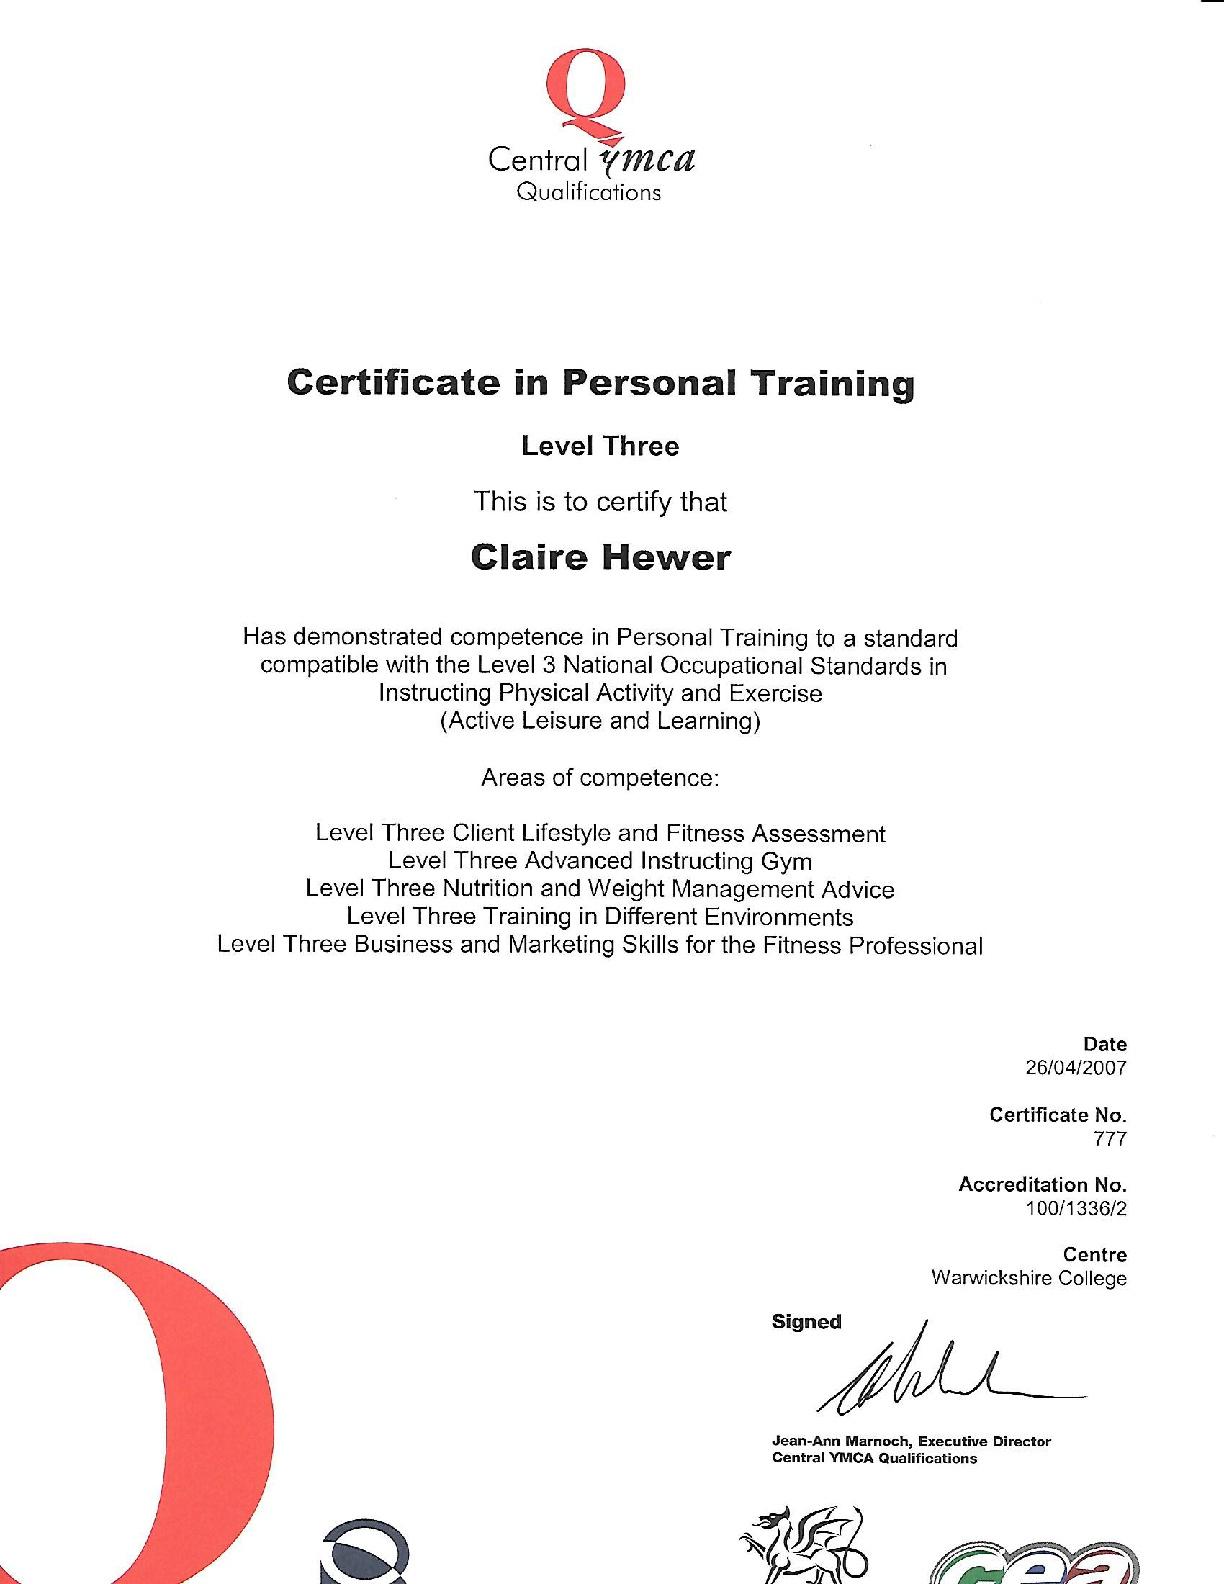 level-3-Personal-trainer-2007-CERT-001